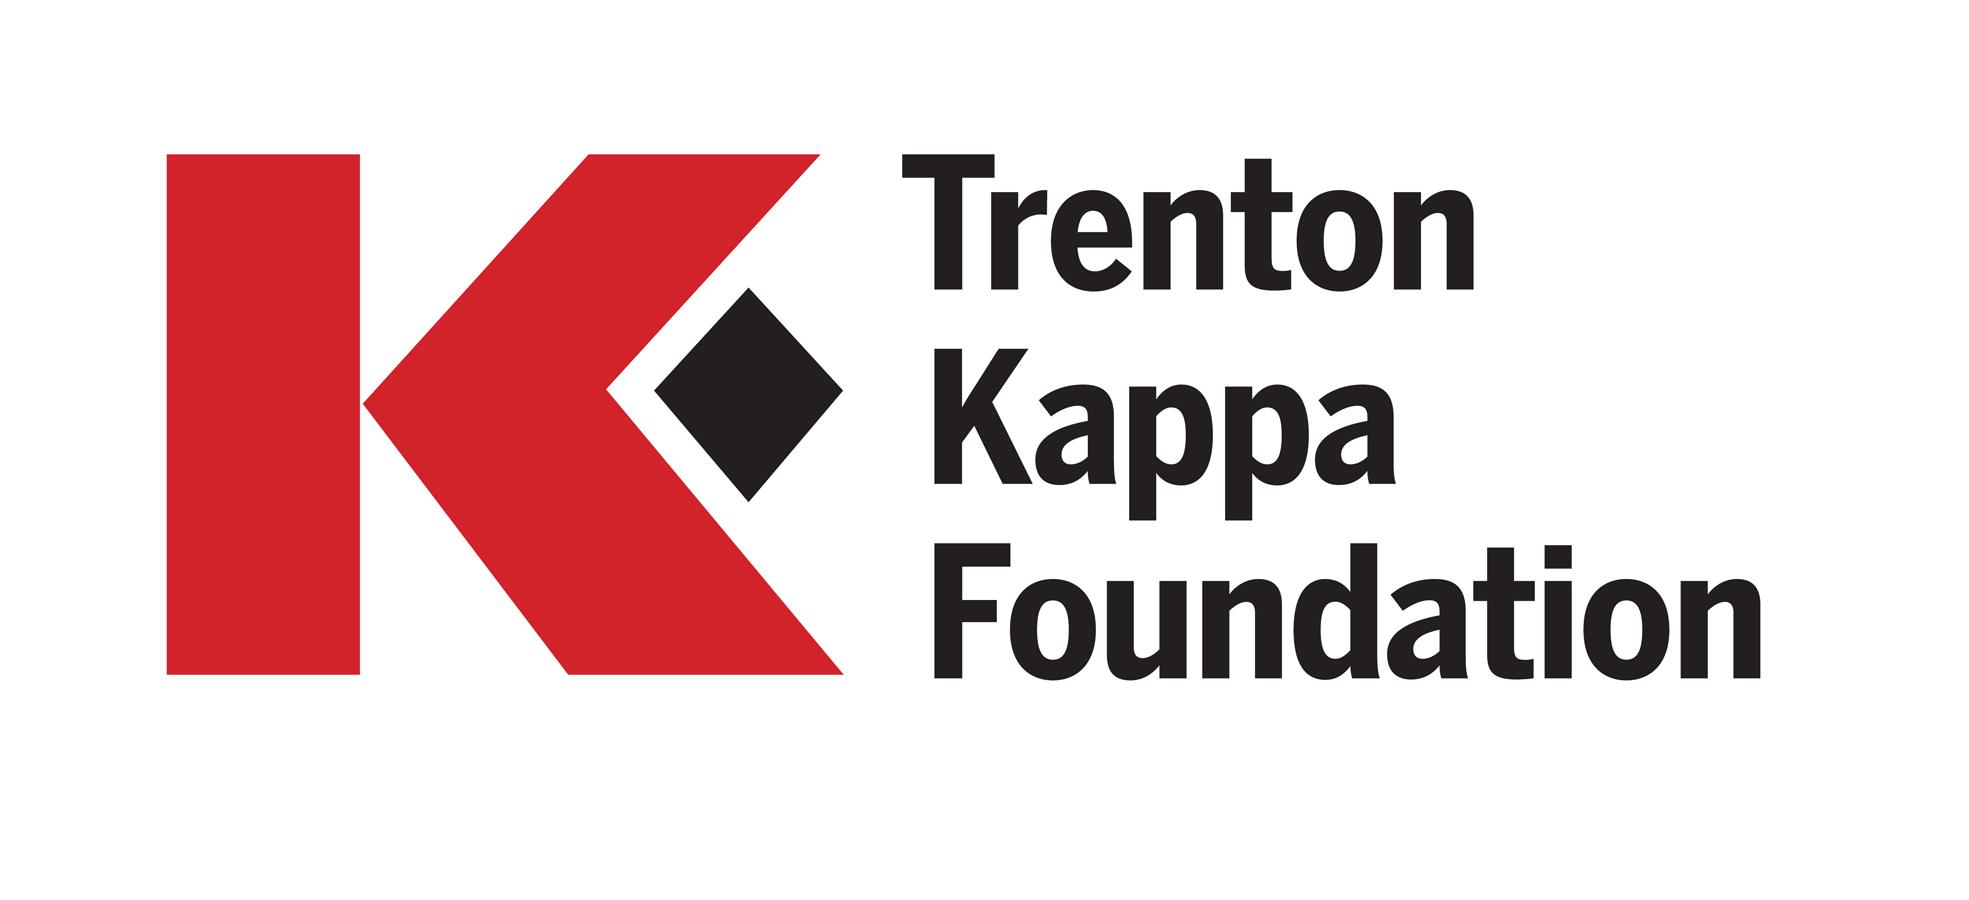 Trenton Kappa Foundation